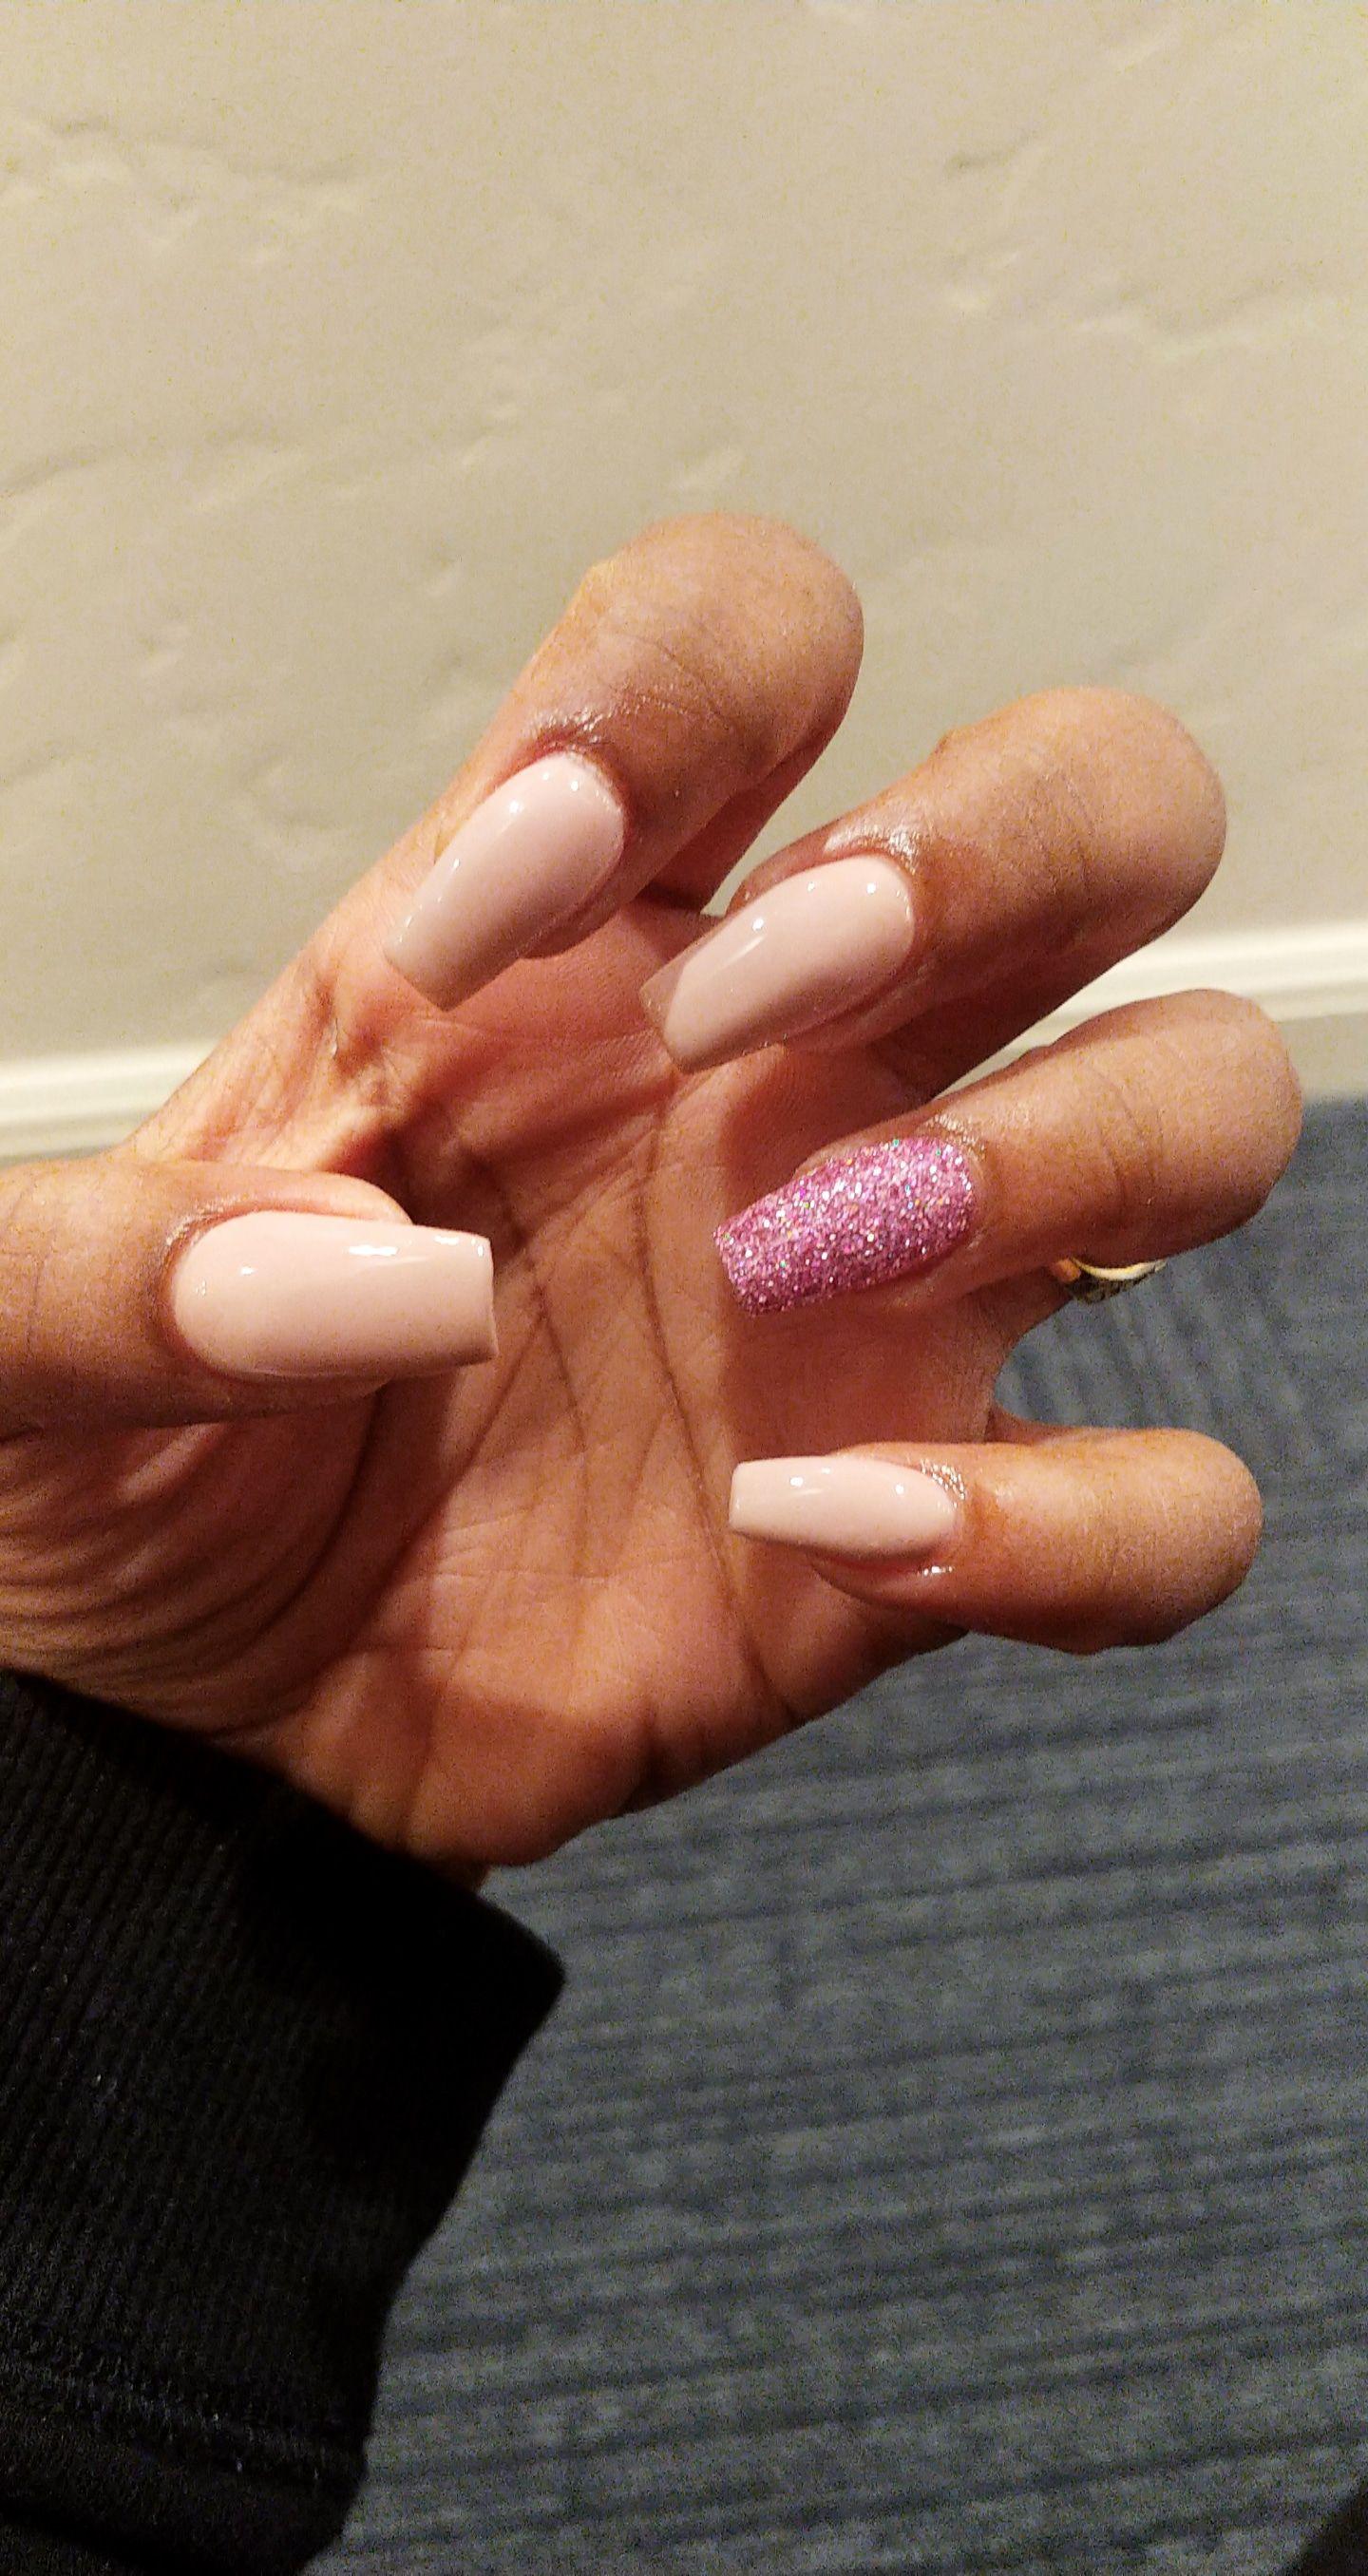 Summer Nails Nail Polish Brand Dnd Gel Polish Colors Cinnamon Whip 613 And Pretty In Pink 461 Nails Dnd Gel Polish Gel Polish Colors Summer Gel Nails